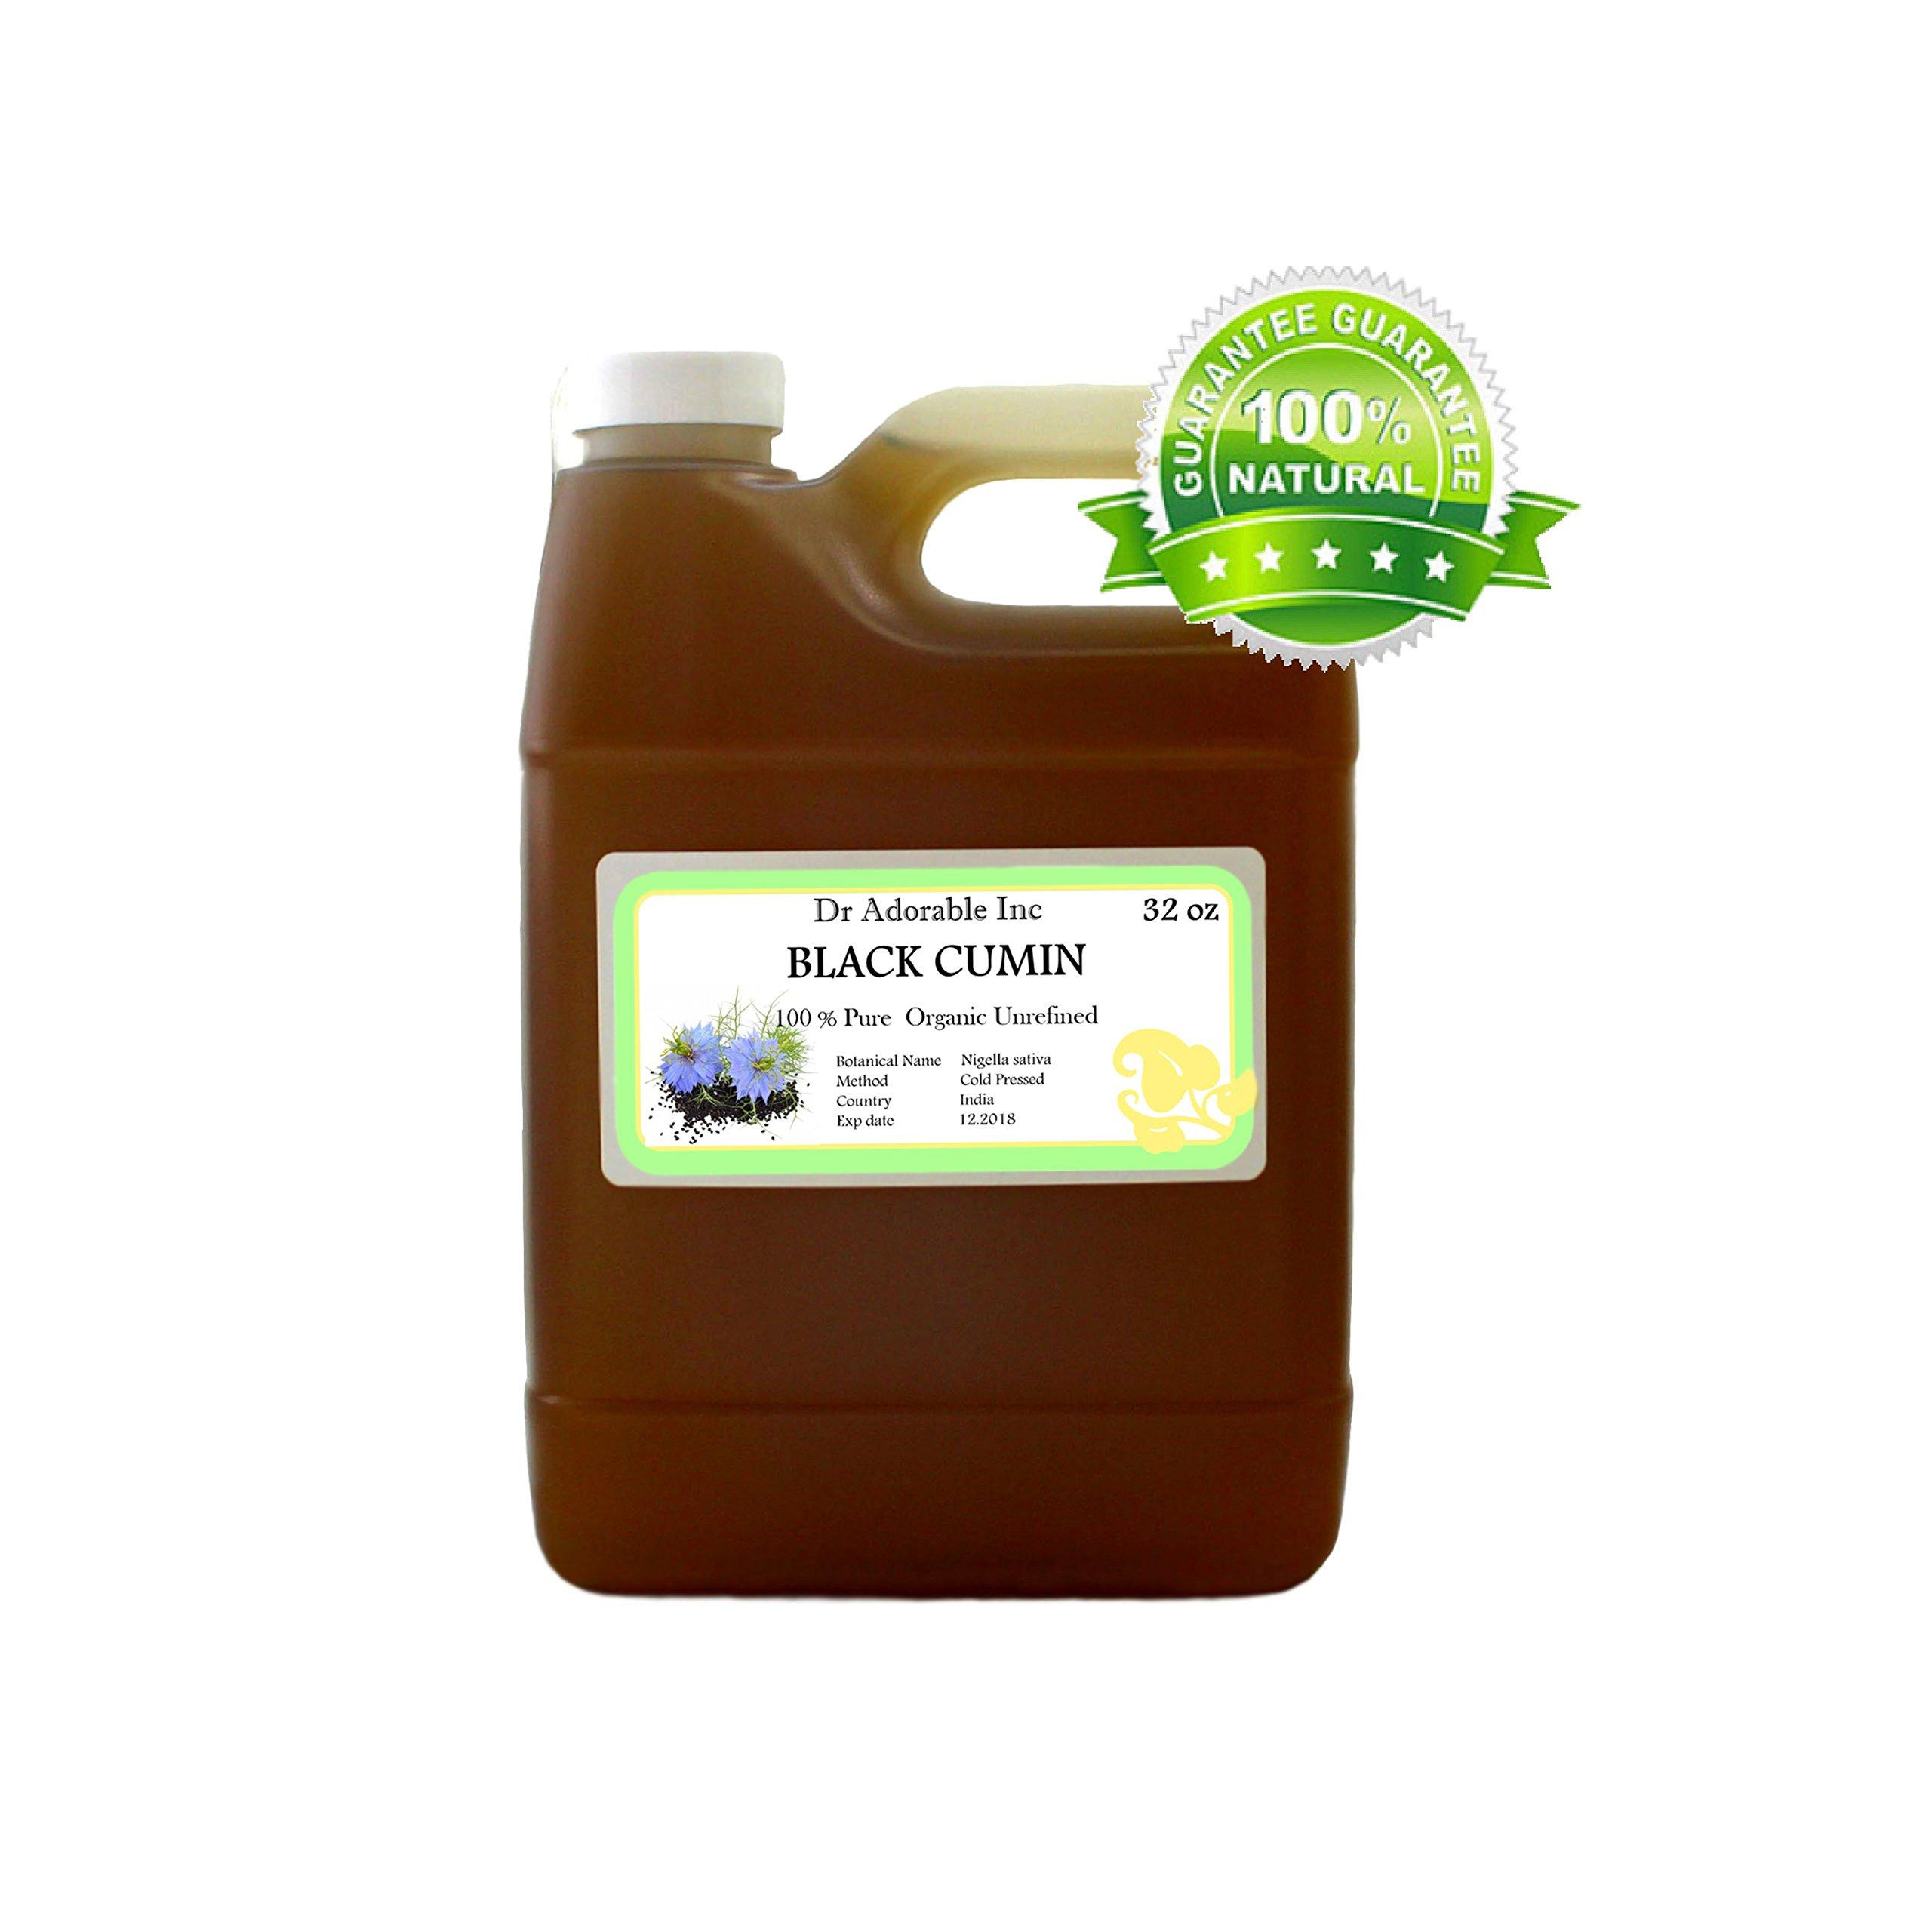 32 Oz/1 Quart Premium Black Cumin Seed (India) Oil Organic Cold Pressed 100% Pure by Dr. Adorable inc (Image #1)